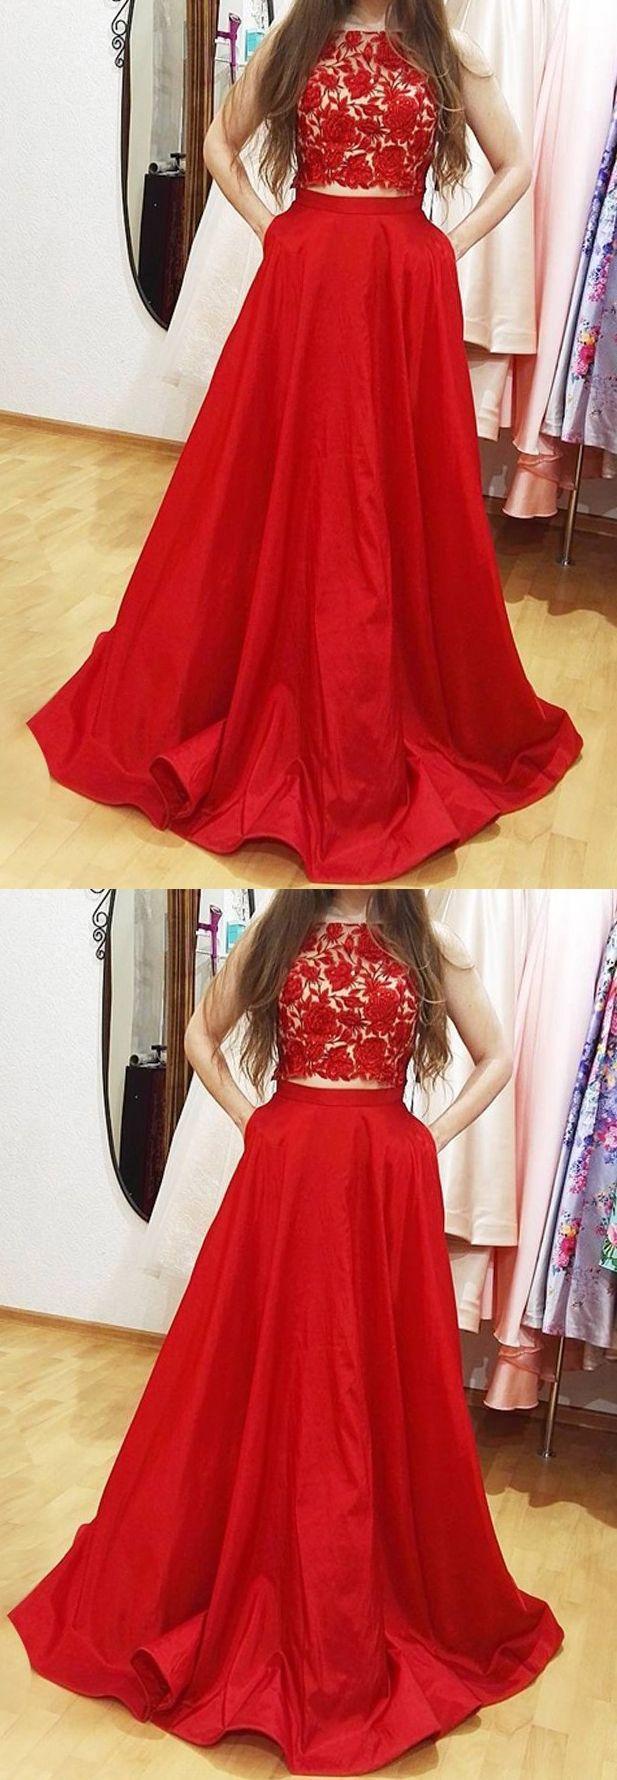 My birthday dresses my birthday dresses pinterest red satin